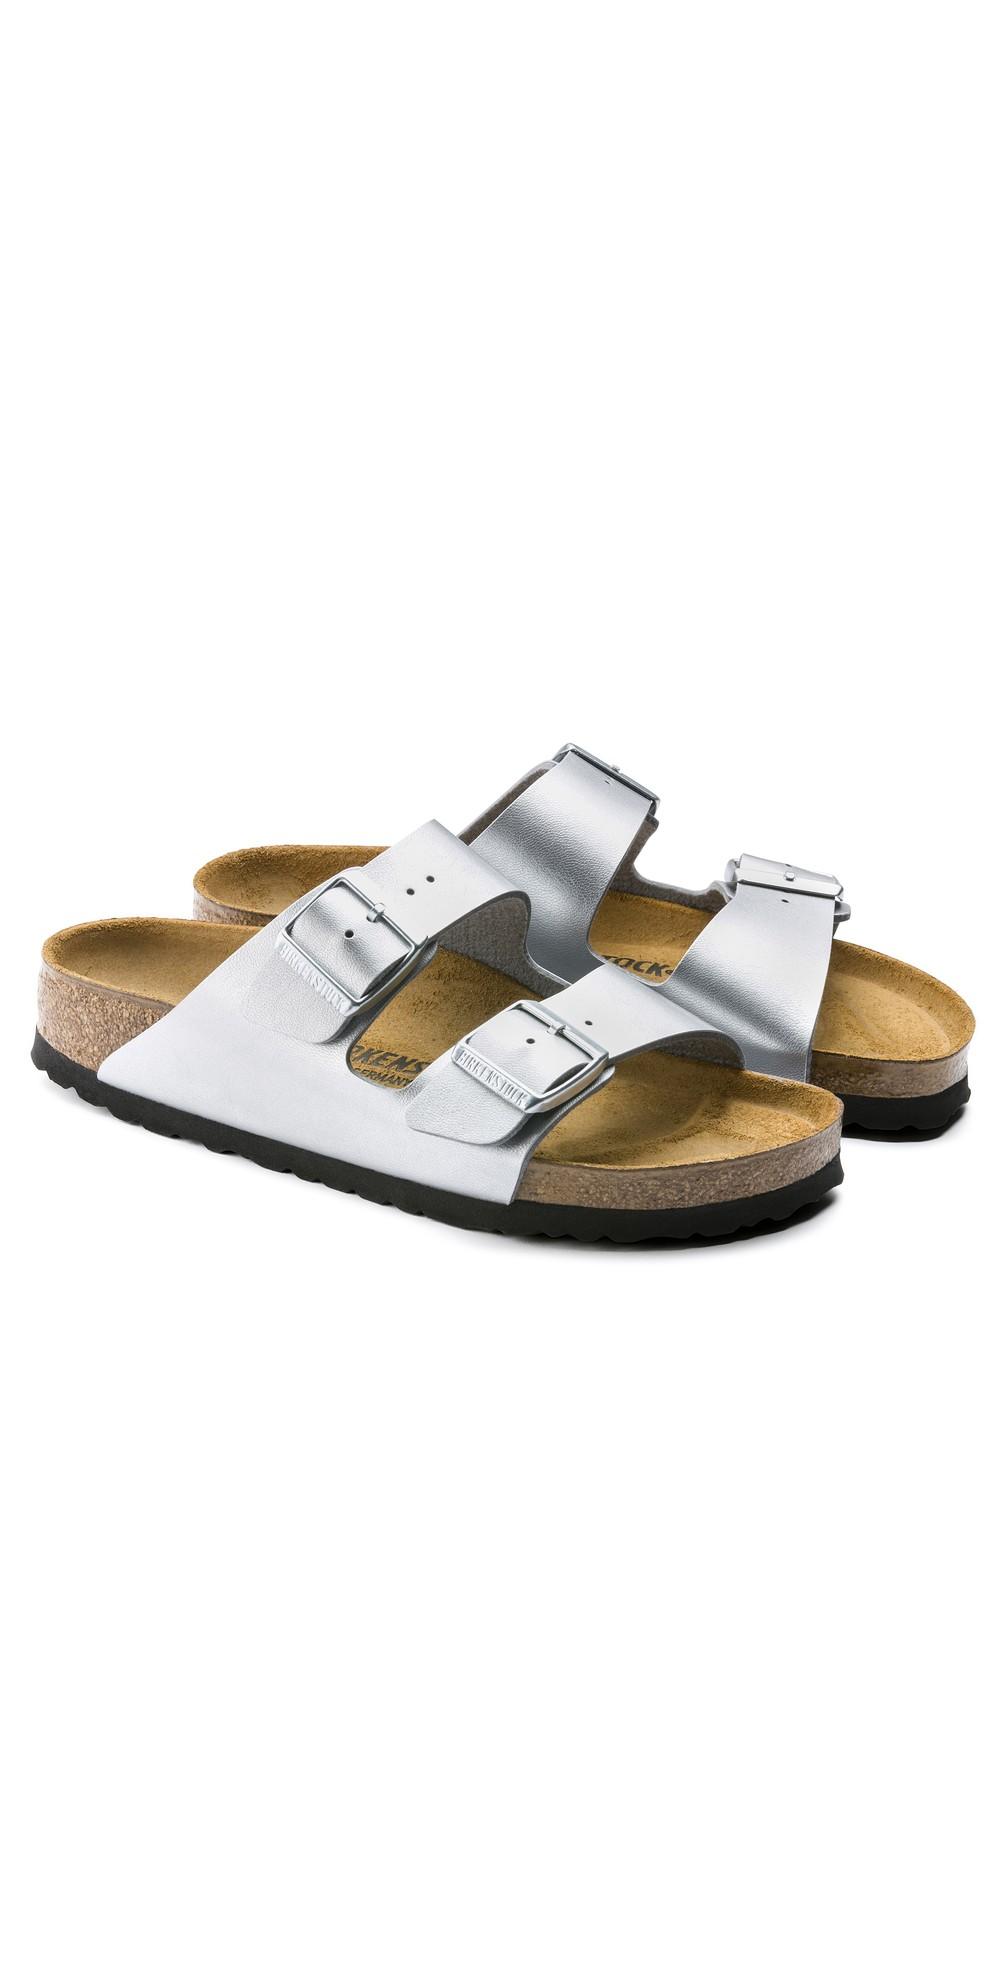 Arizona Silver Birko-Flor® Sandal main image